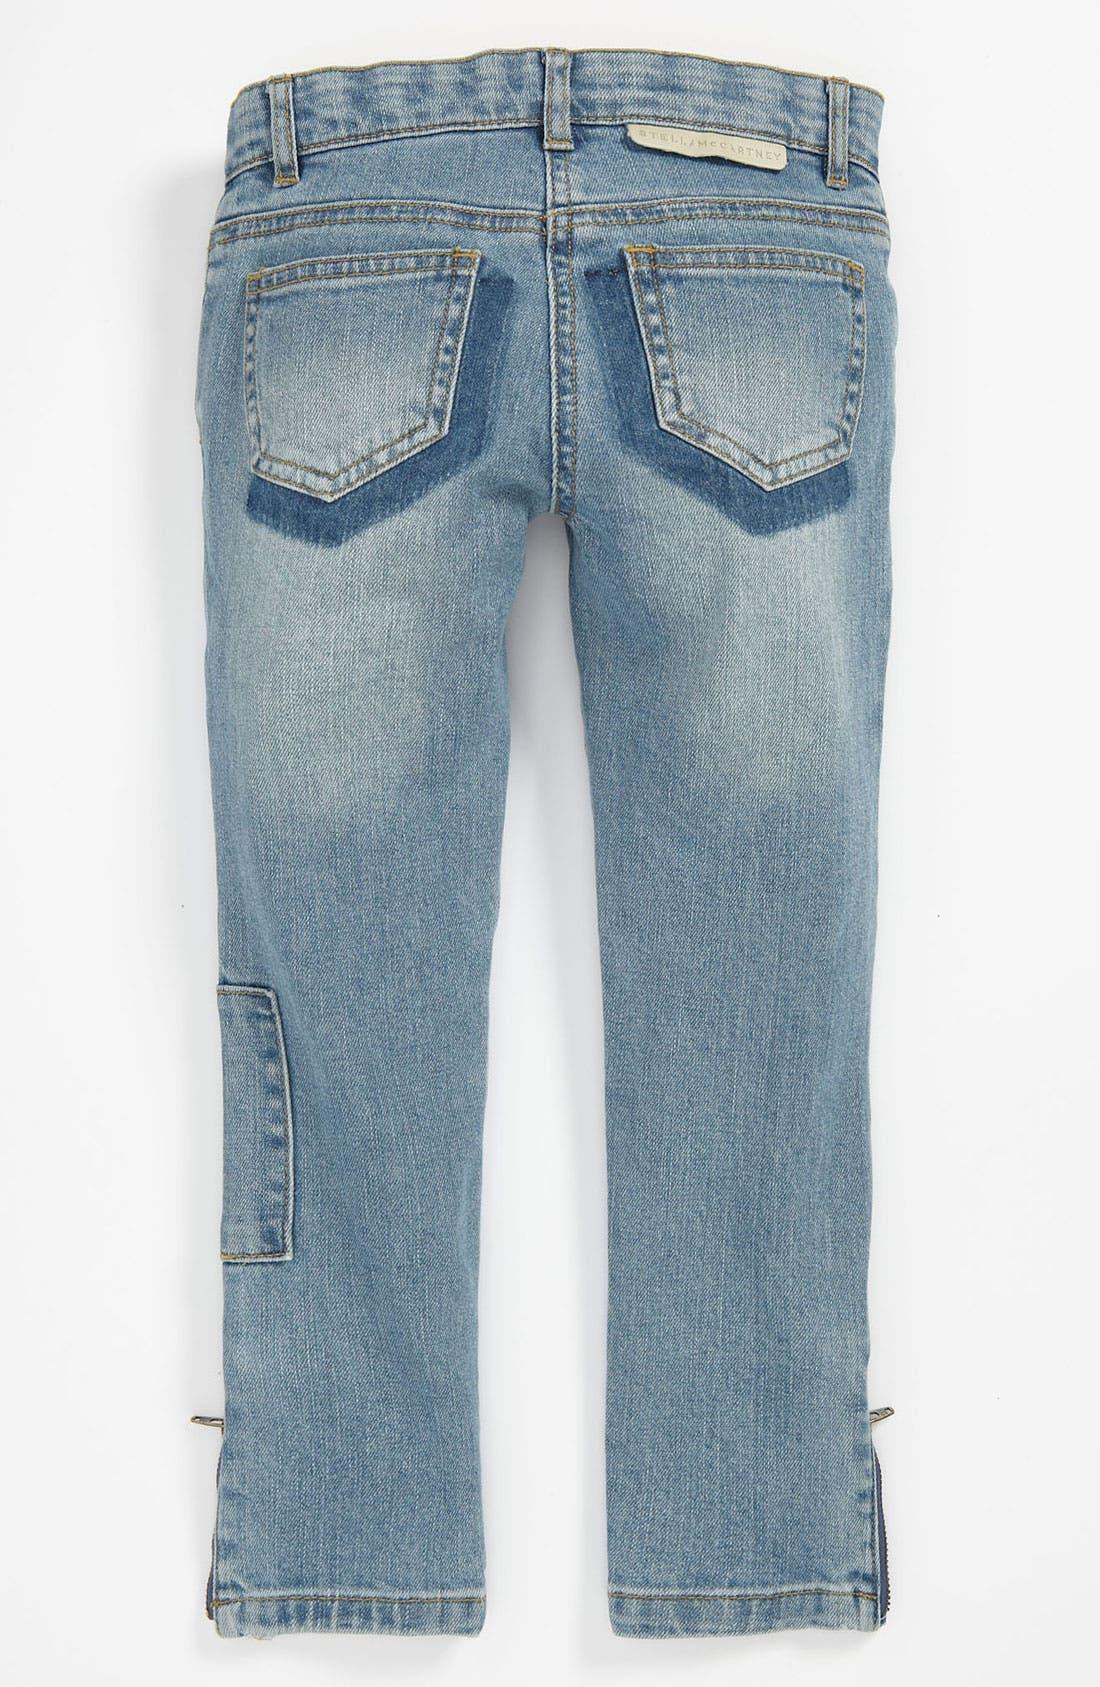 Alternate Image 1 Selected - Stella McCartney Kids 'Nina' Skinny Jeans (Toddler, Little Girls & Big Girls)